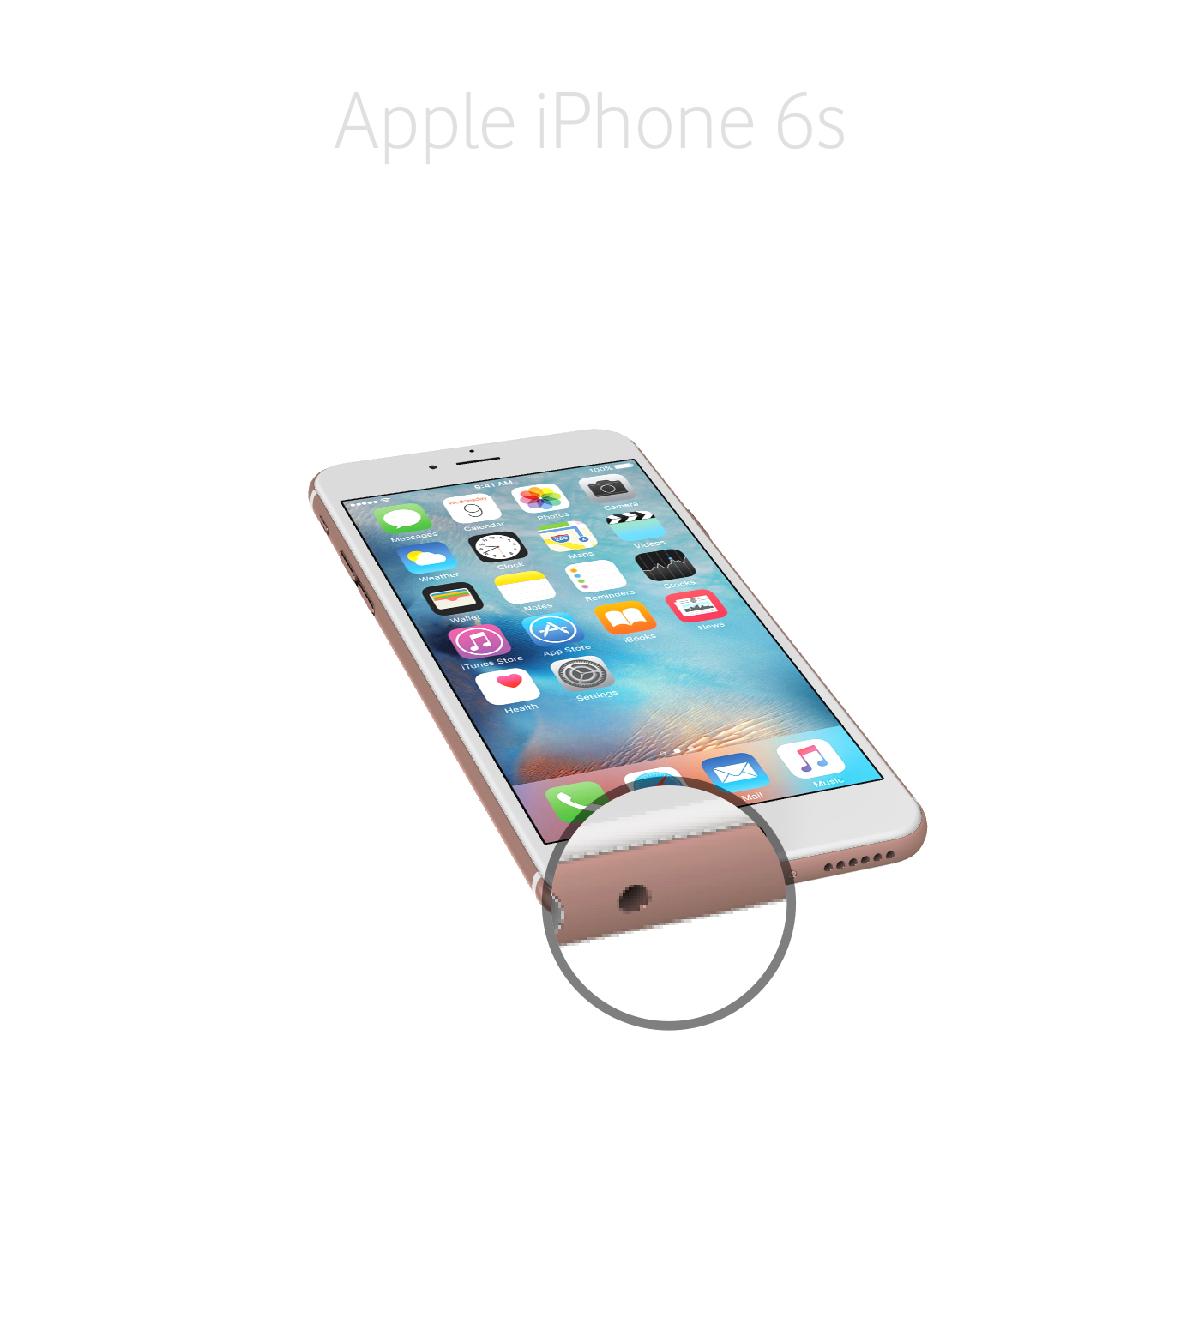 Laga audiokontakt iPhone 6s